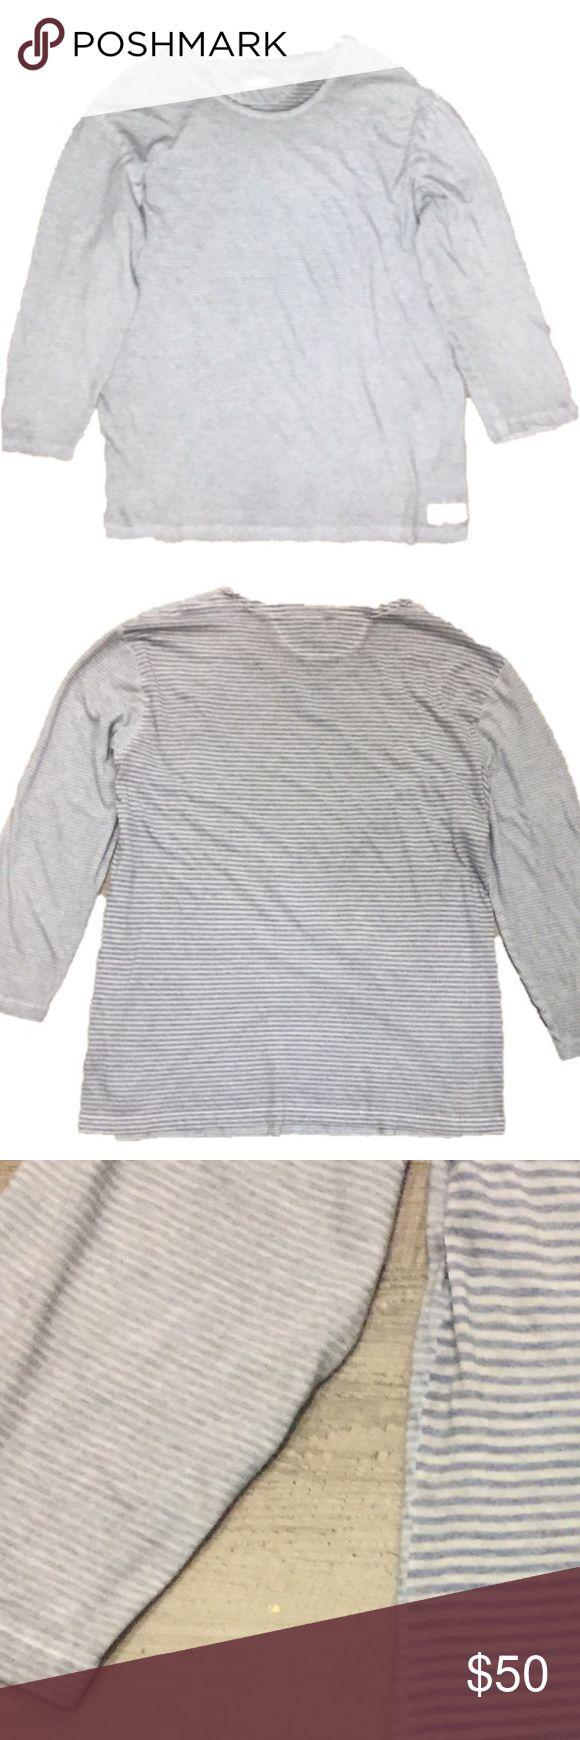 All Saints Spitalfields Long Sleeve Stripes Tee XL Excellent condition, super soft striped men's long sleeve t-shirt.  Small striped front, larger striped back.  XL. All Saints Shirts Tees - Long Sleeve